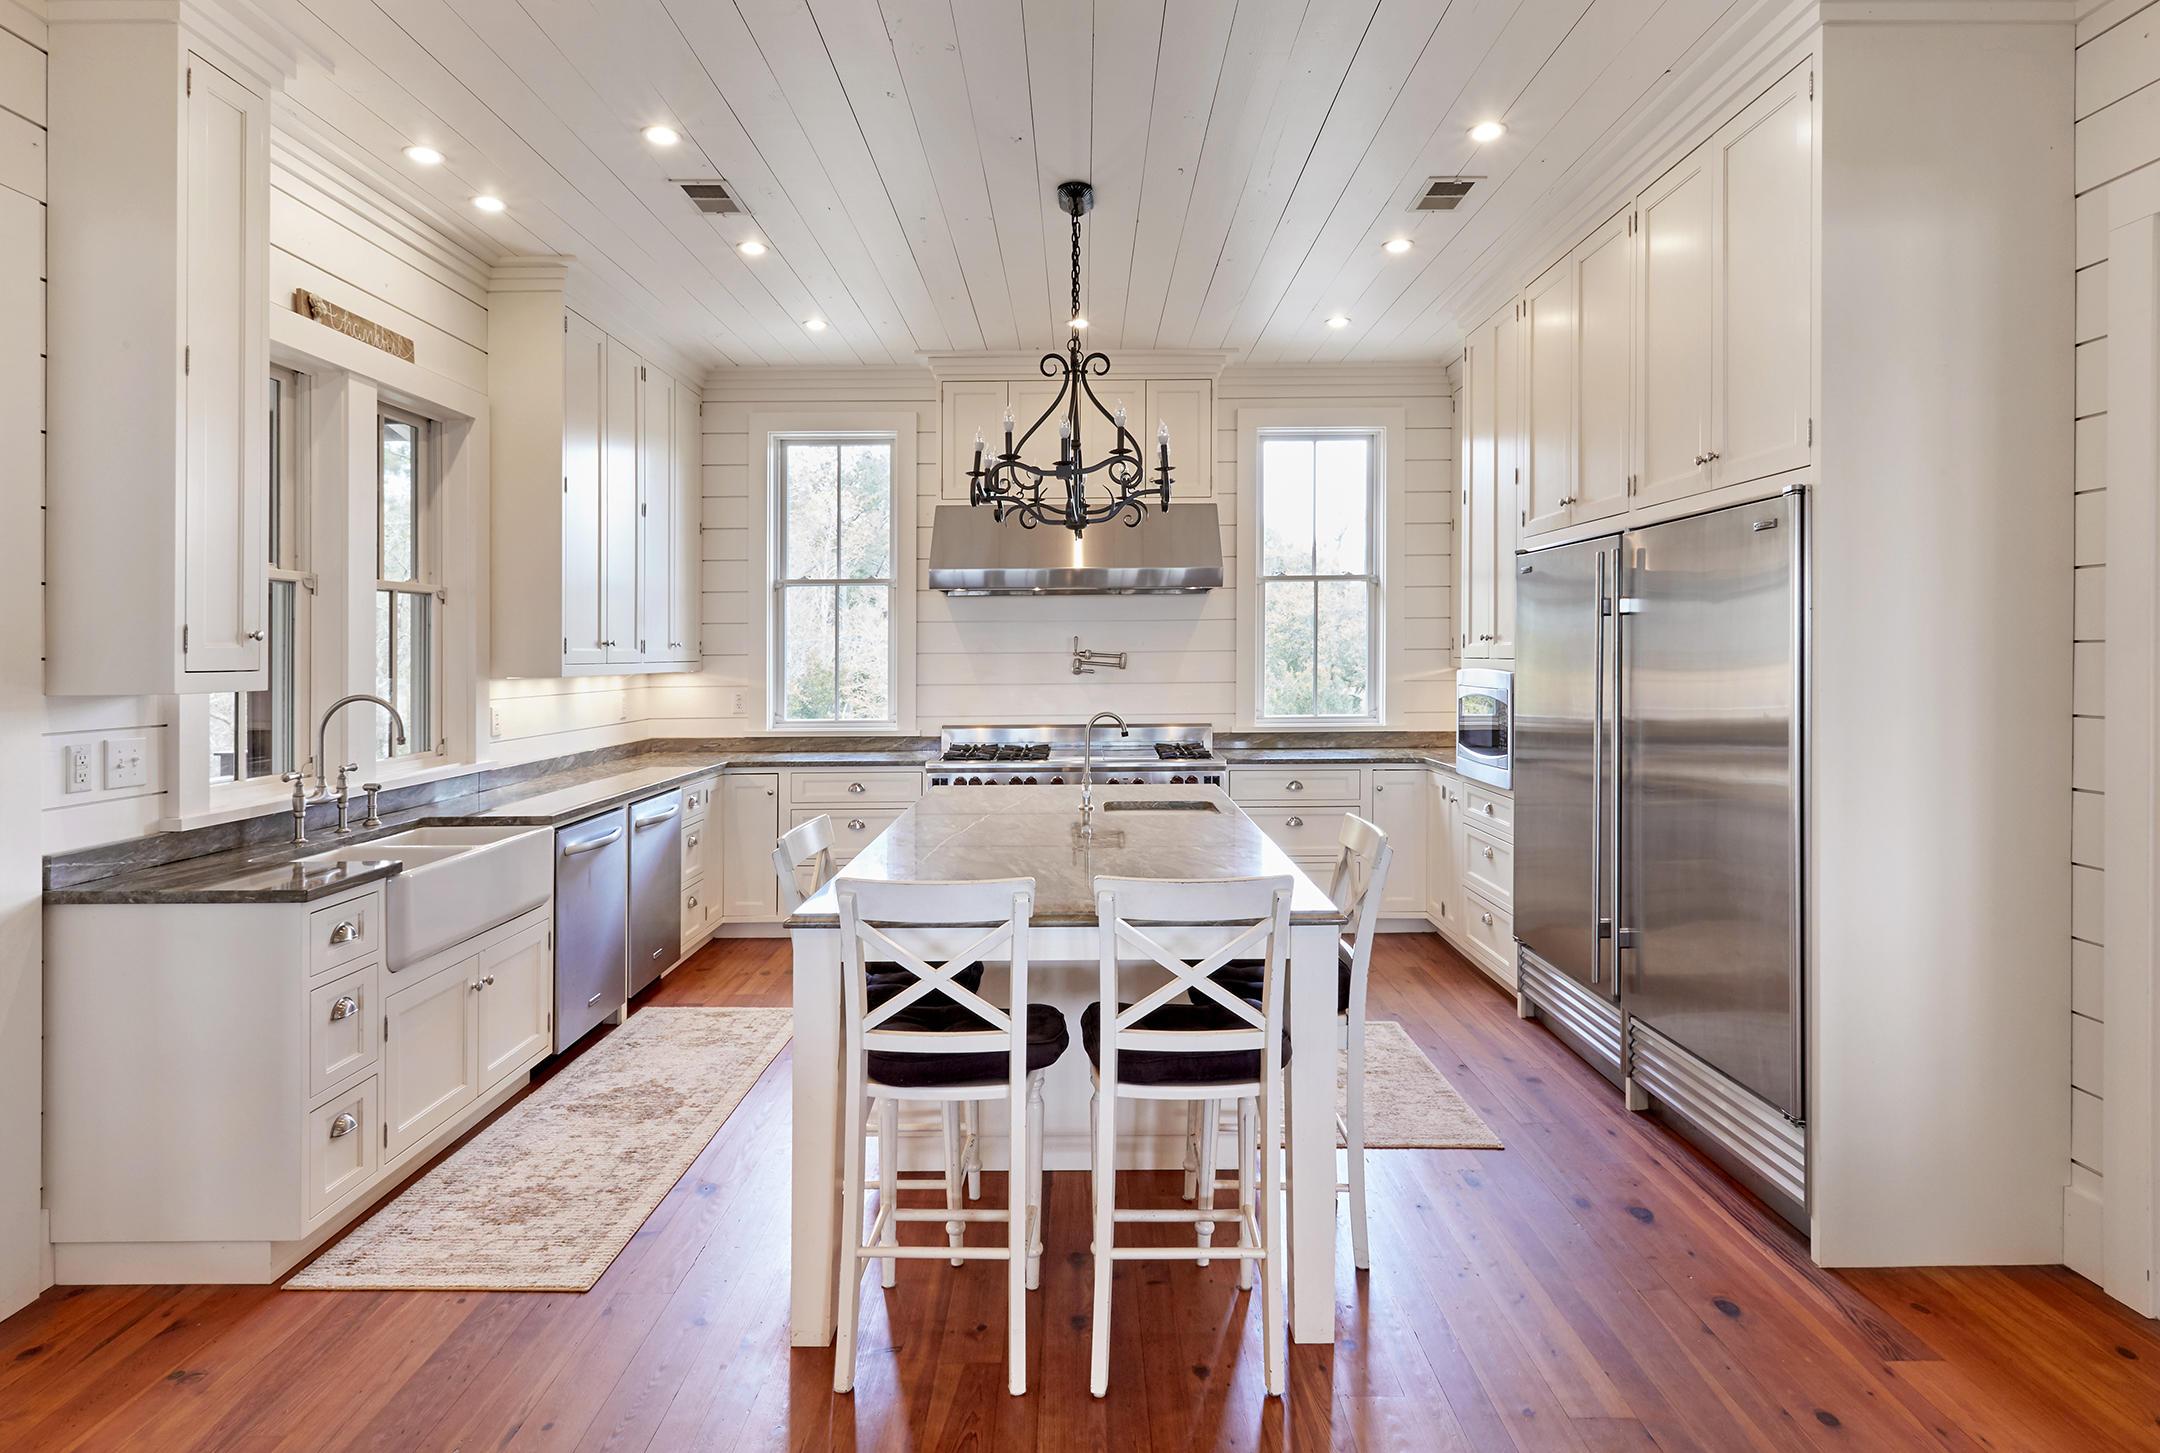 White Stalls Pt Jackson Homes For Sale - 625 Hall, Awendaw, SC - 7